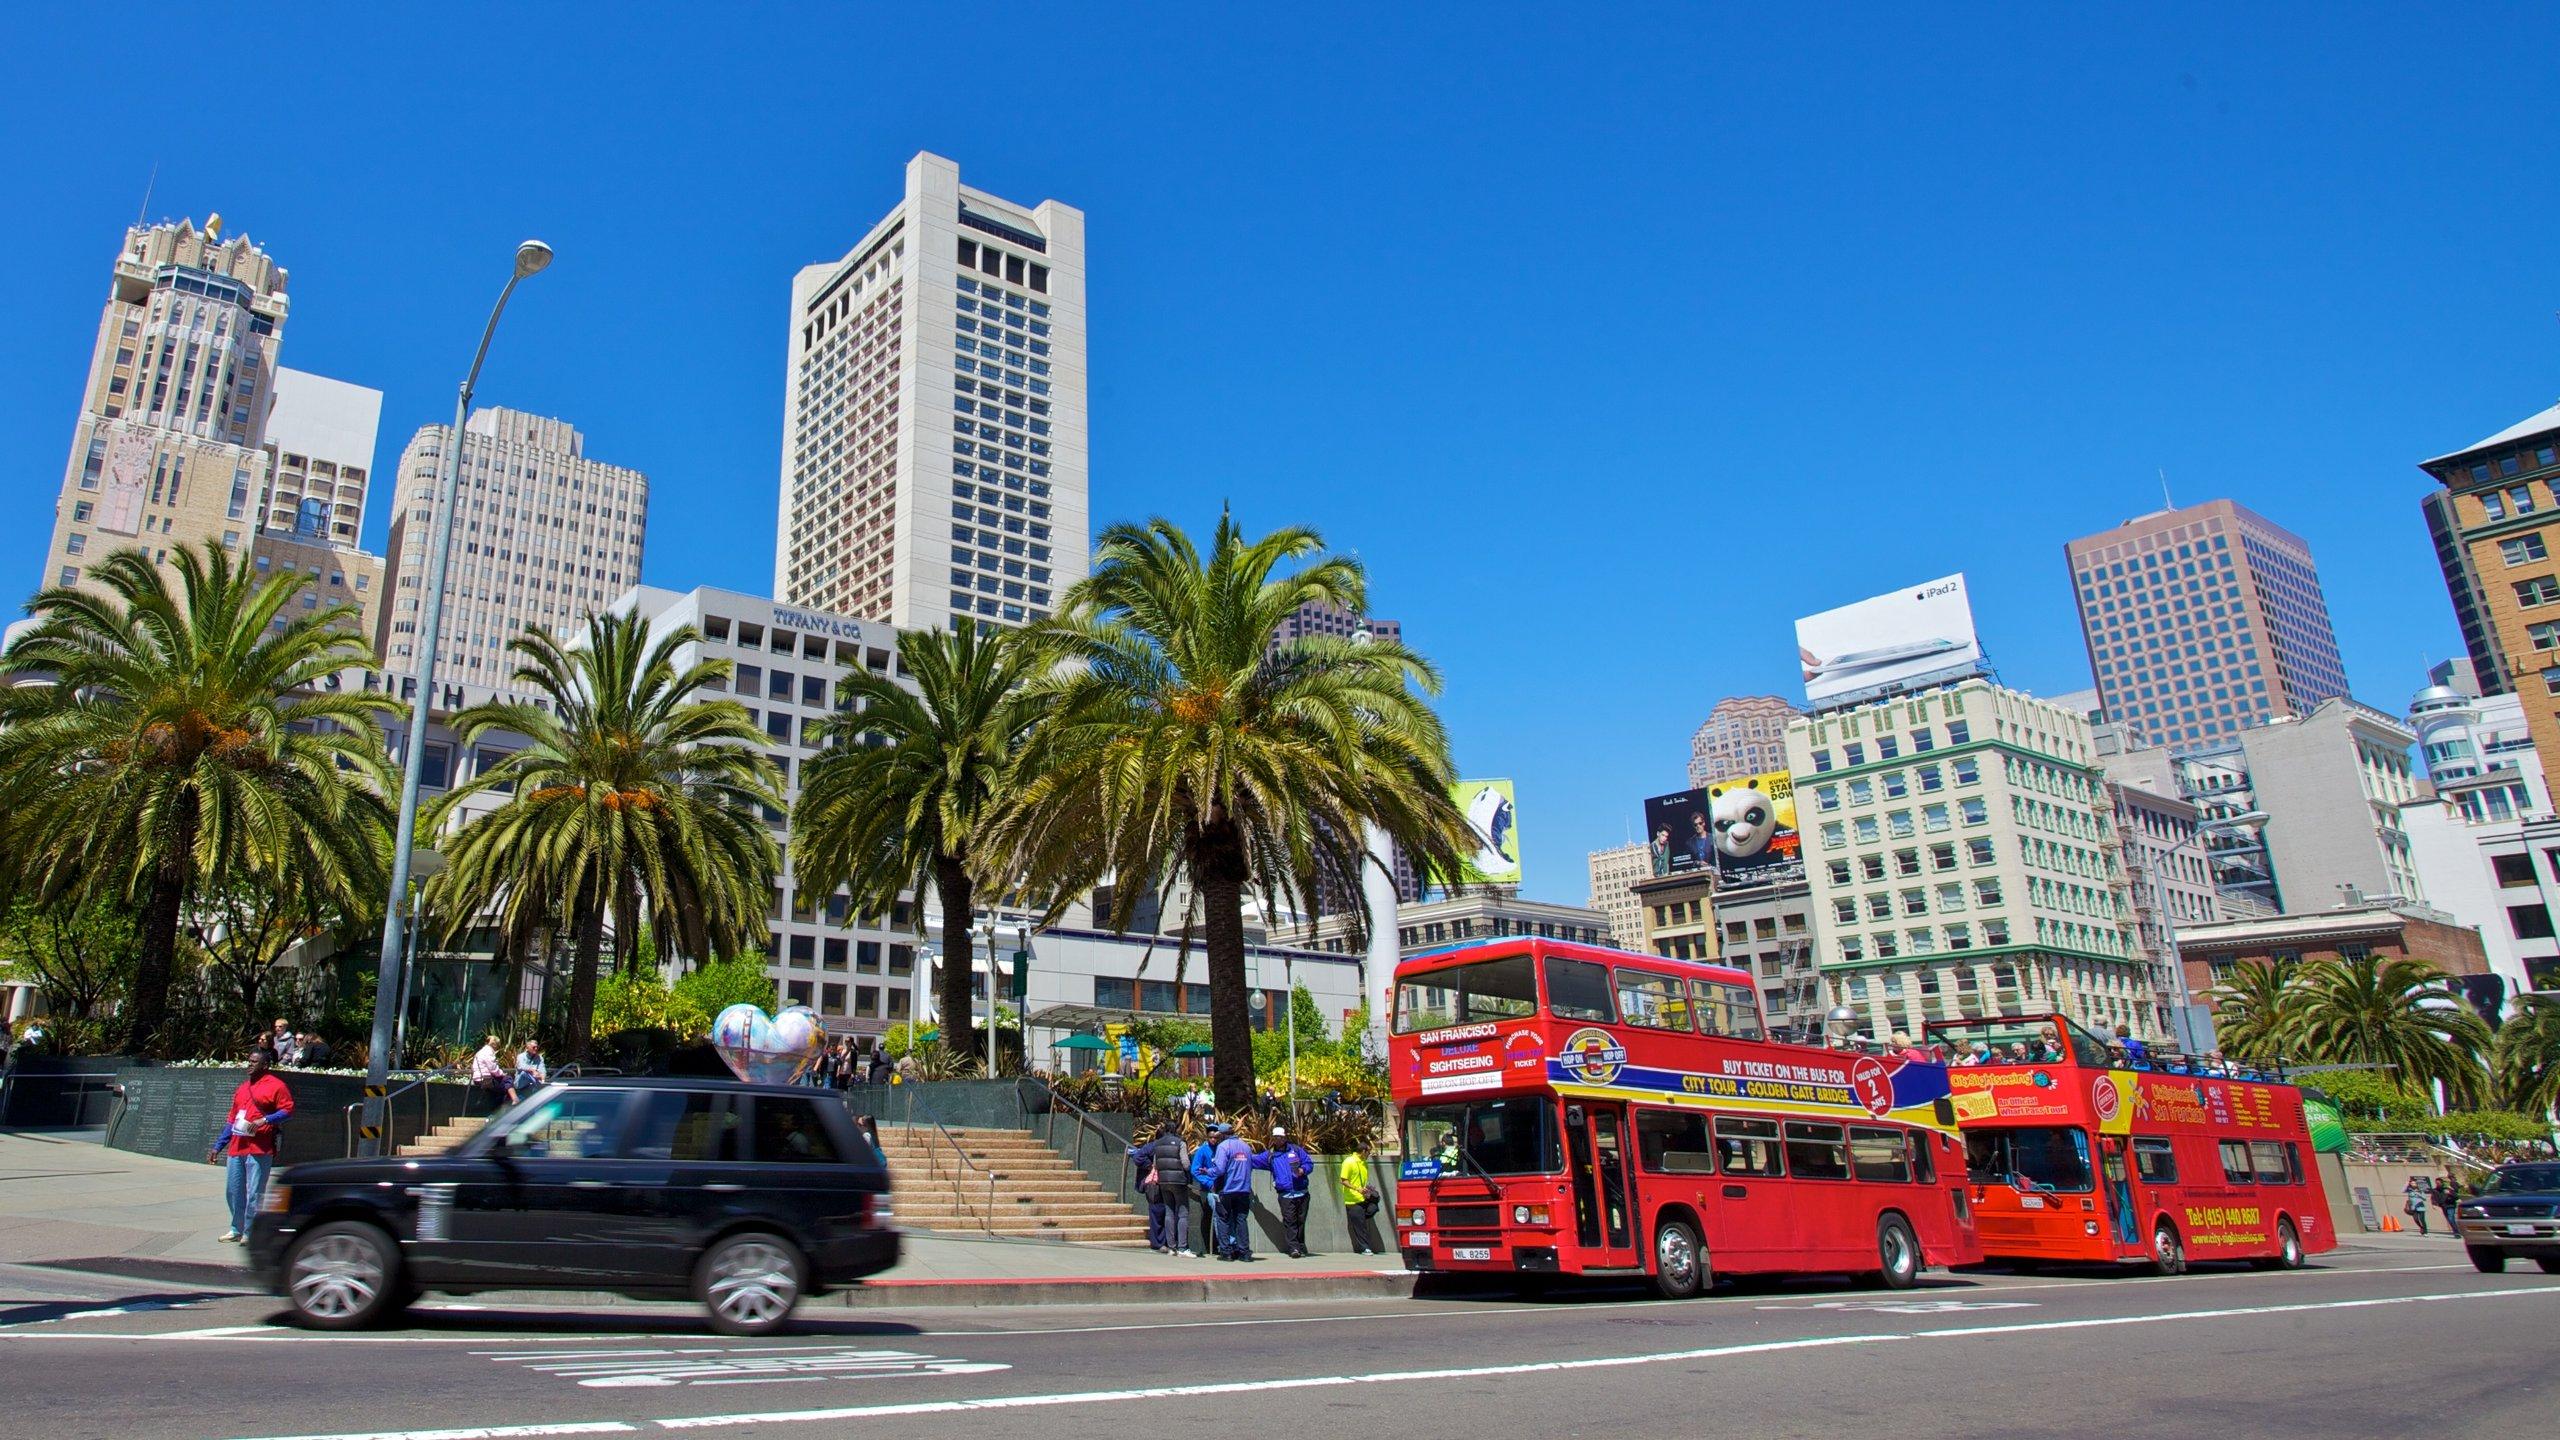 Union Square, San Francisco, San Francisco County, California, United States of America